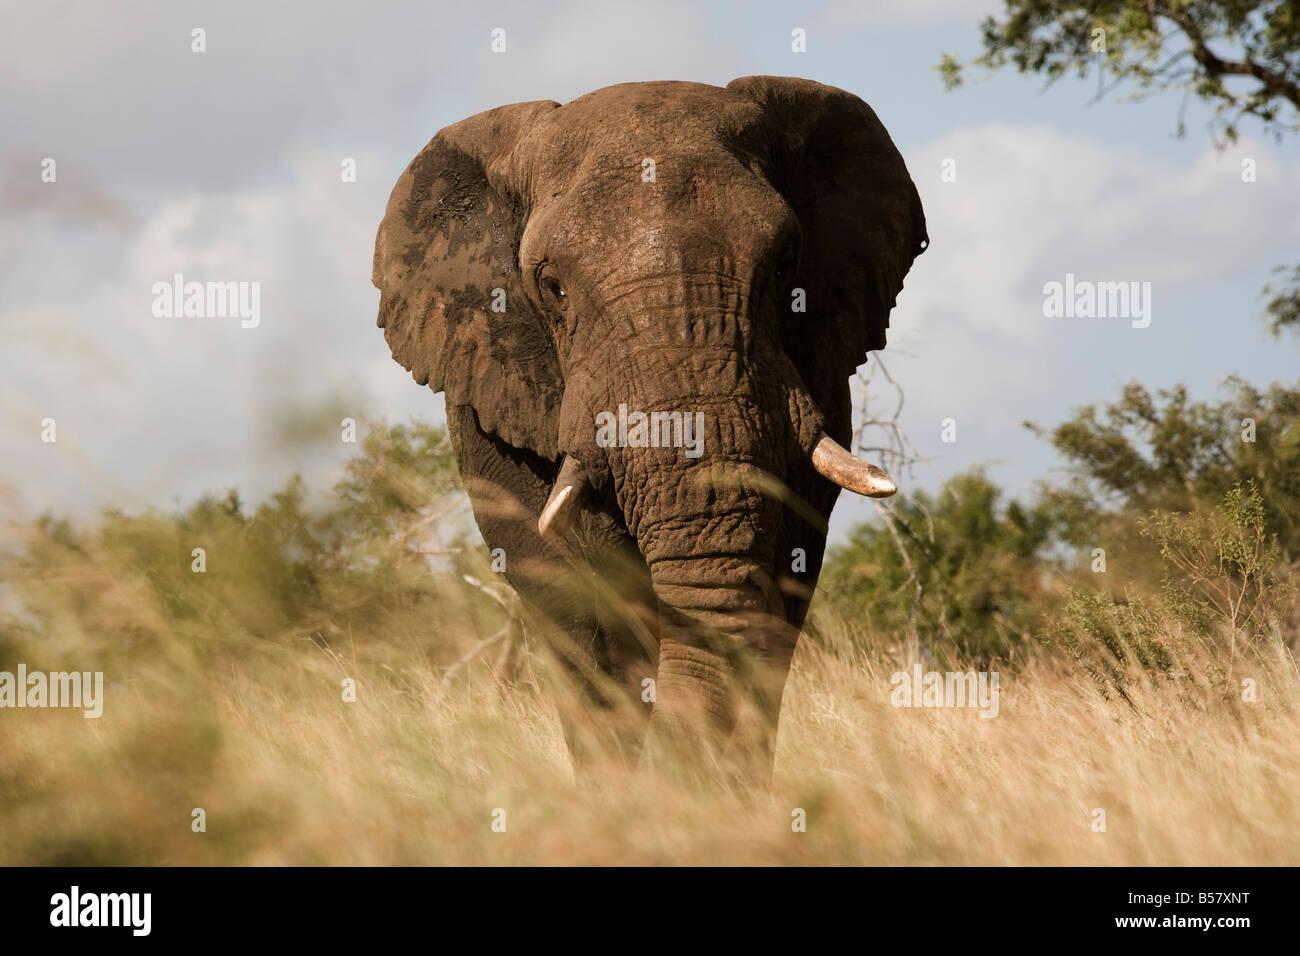 Bull del elefante africano (Loxodonta africana), el Parque Nacional Kruger, Mpumalanga, Sudáfrica, África Imagen De Stock